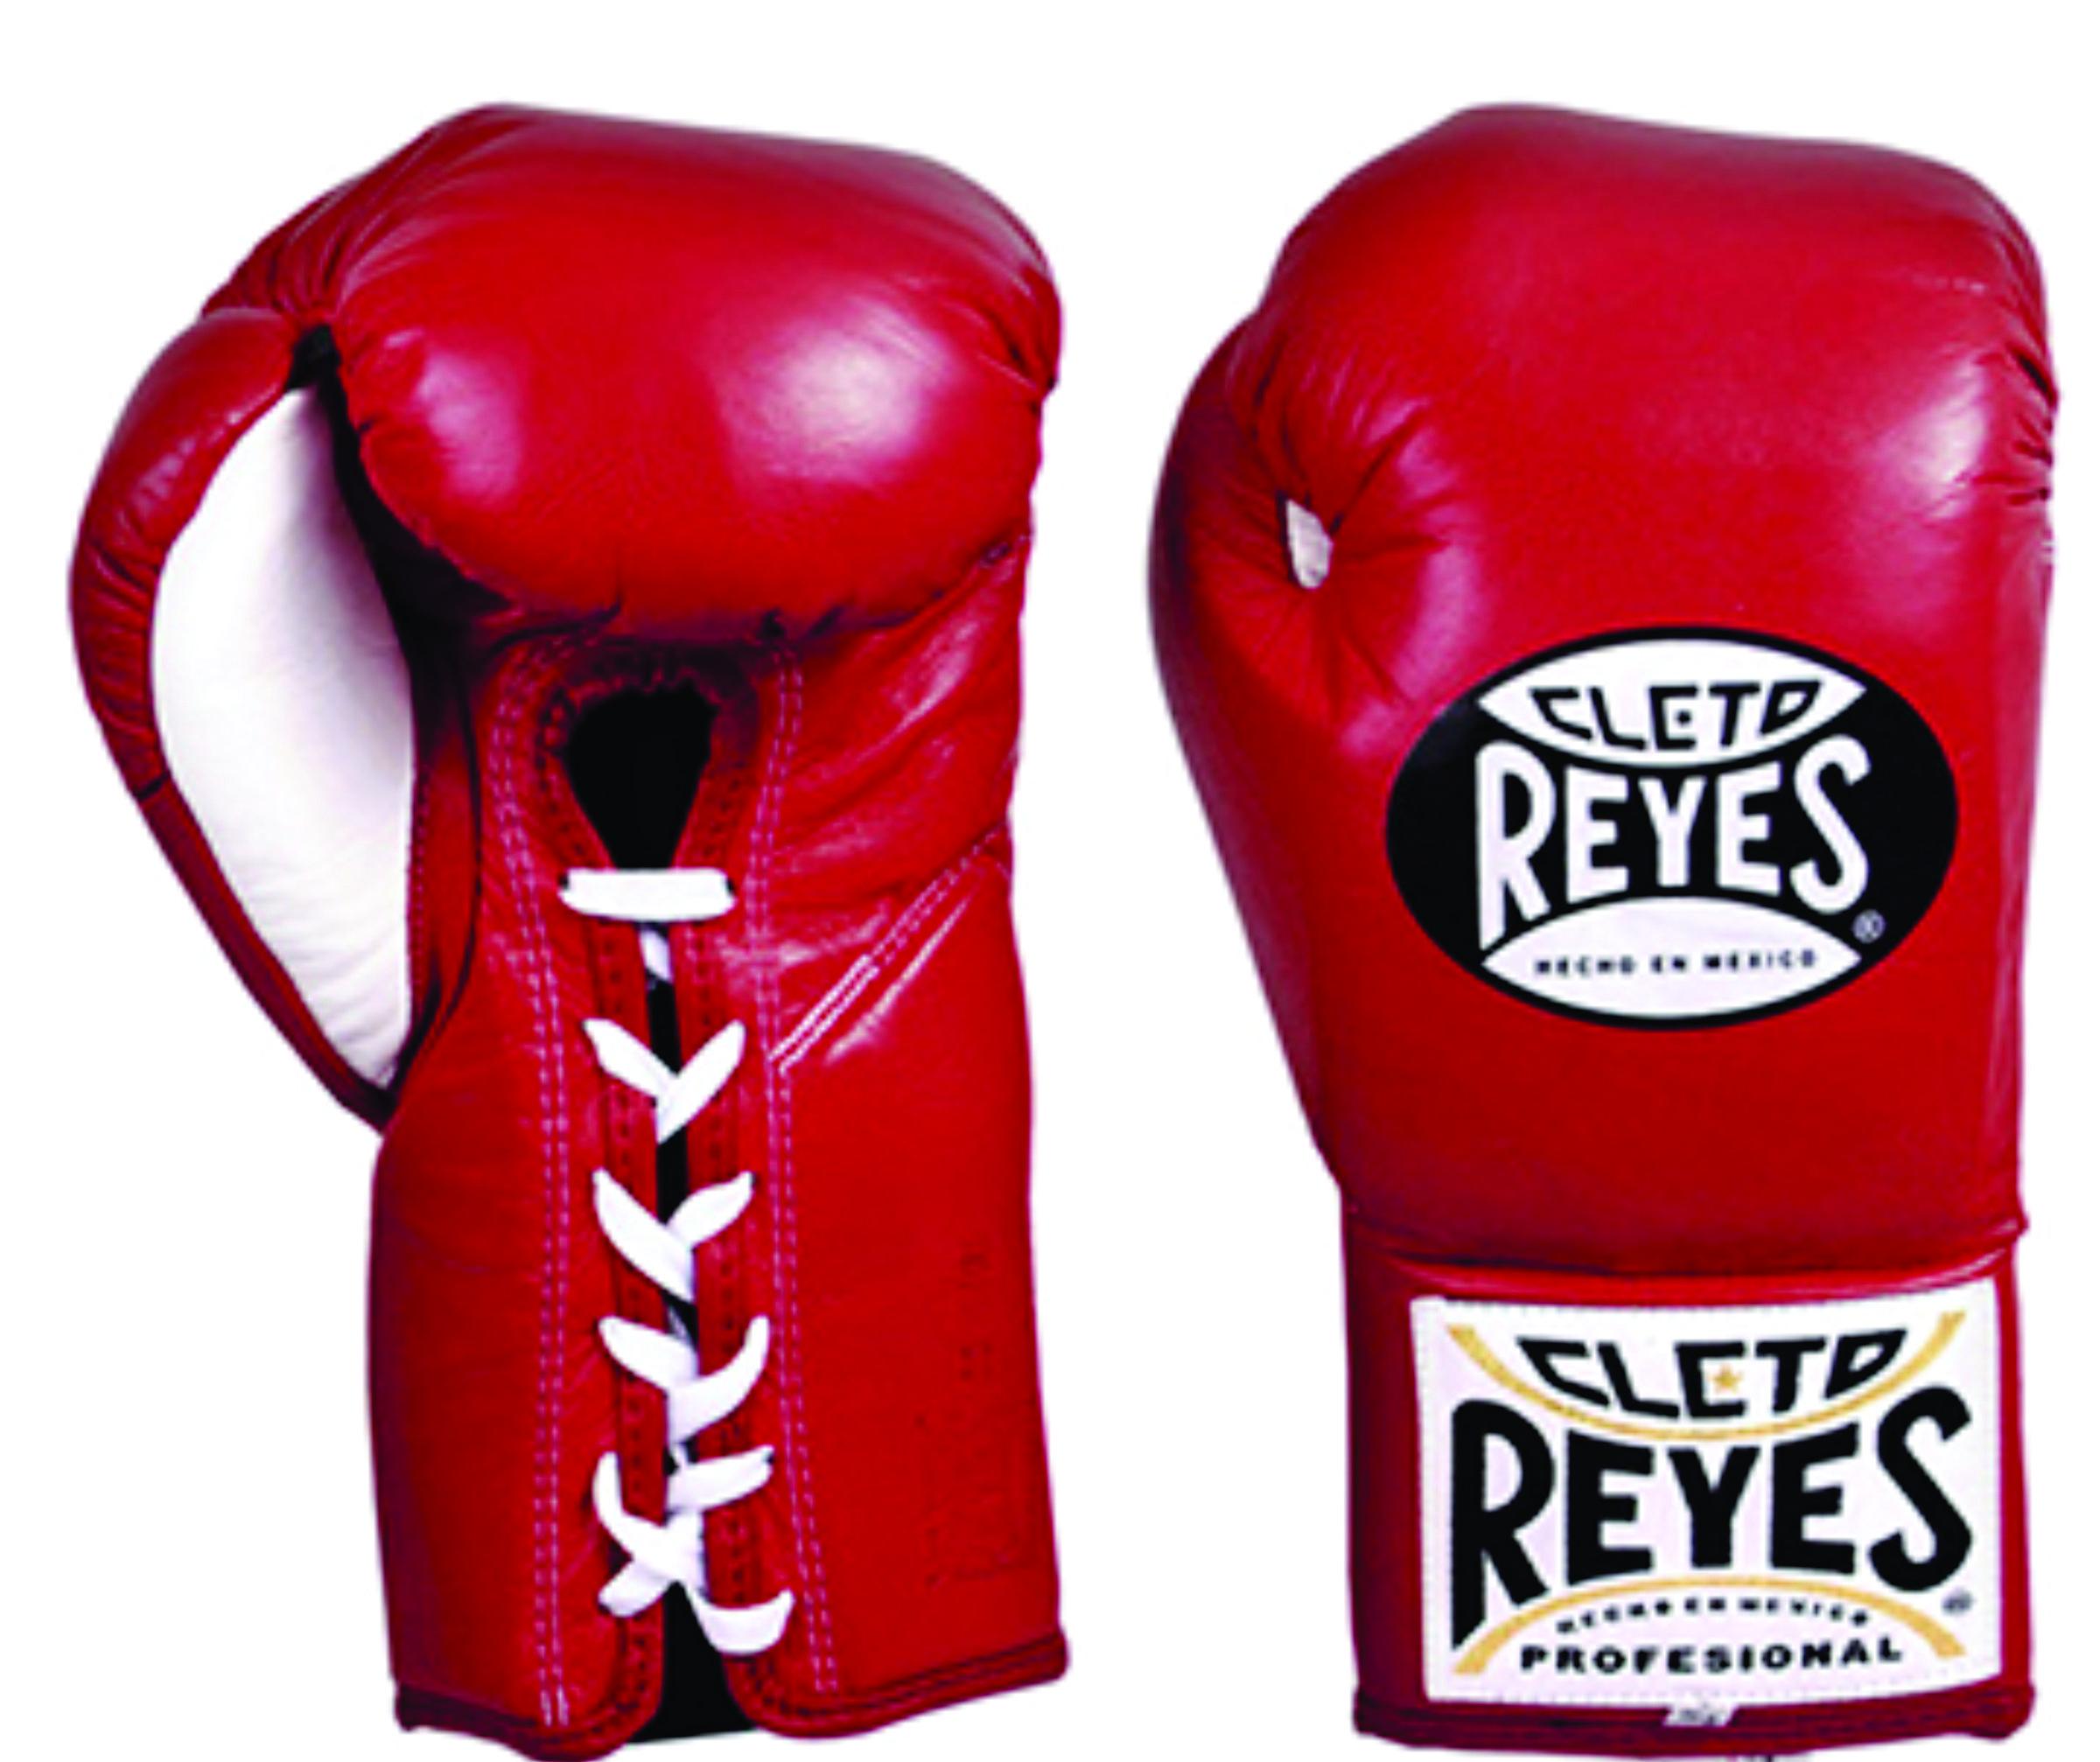 Cleto Reyes Boxing Gloves Genuine Leather Gloves